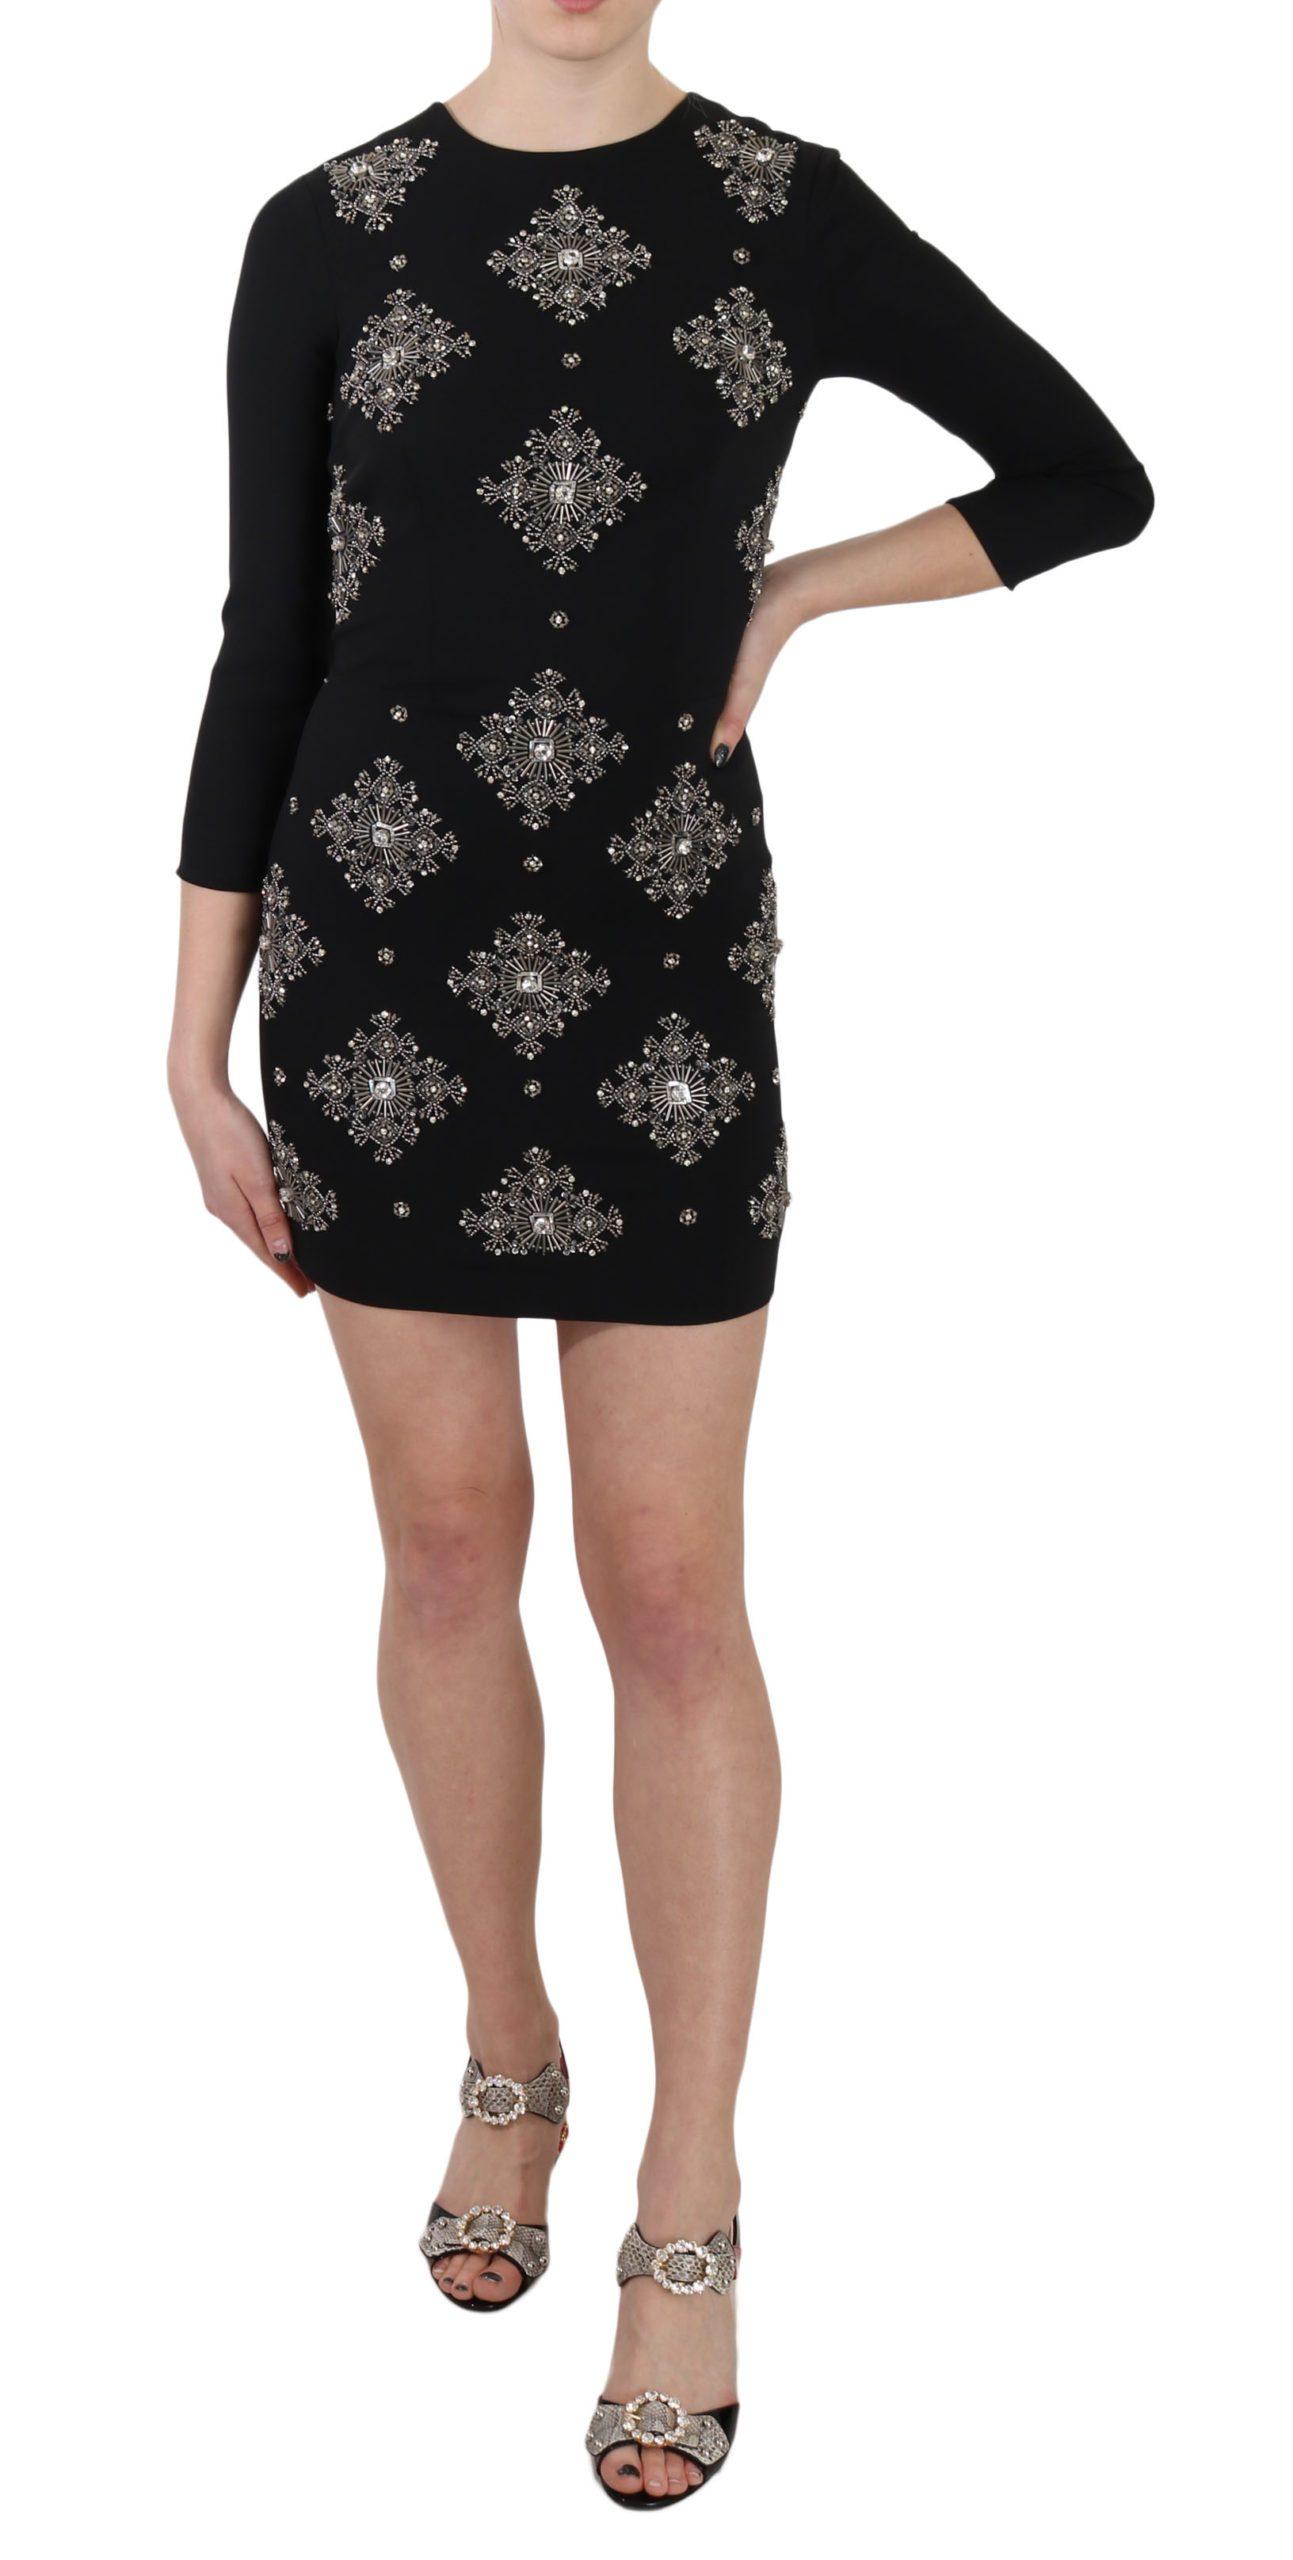 John Richmond Women's Crystal Stretch Mini Shift Dress Black DR1673 - IT38 XS